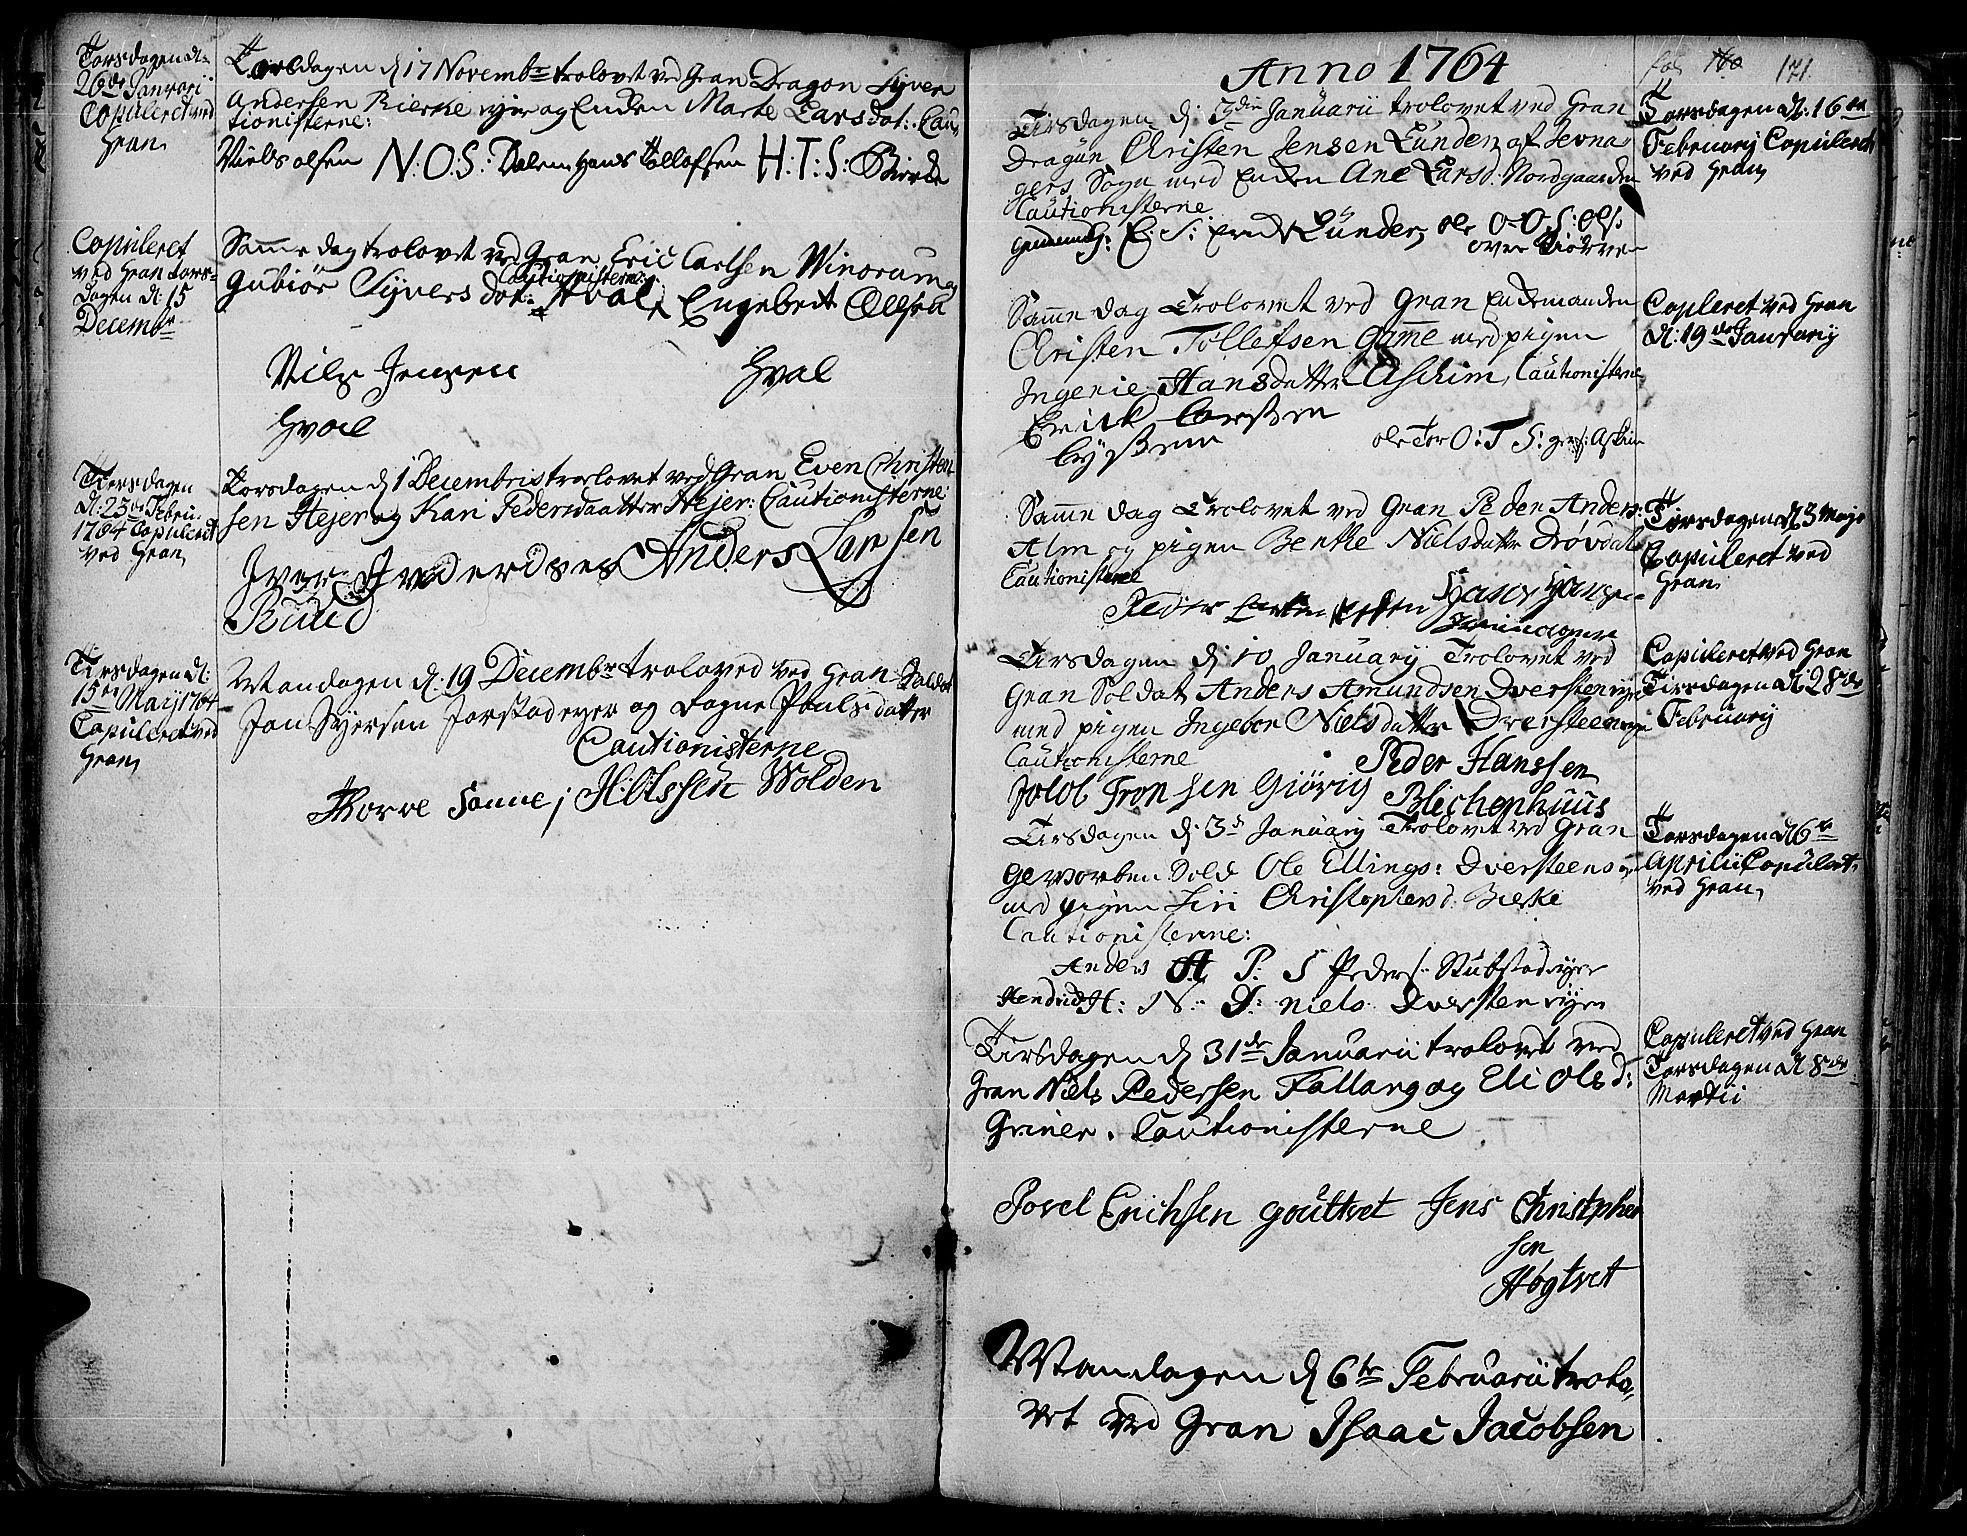 SAH, Gran prestekontor, Ministerialbok nr. 4, 1759-1775, s. 171